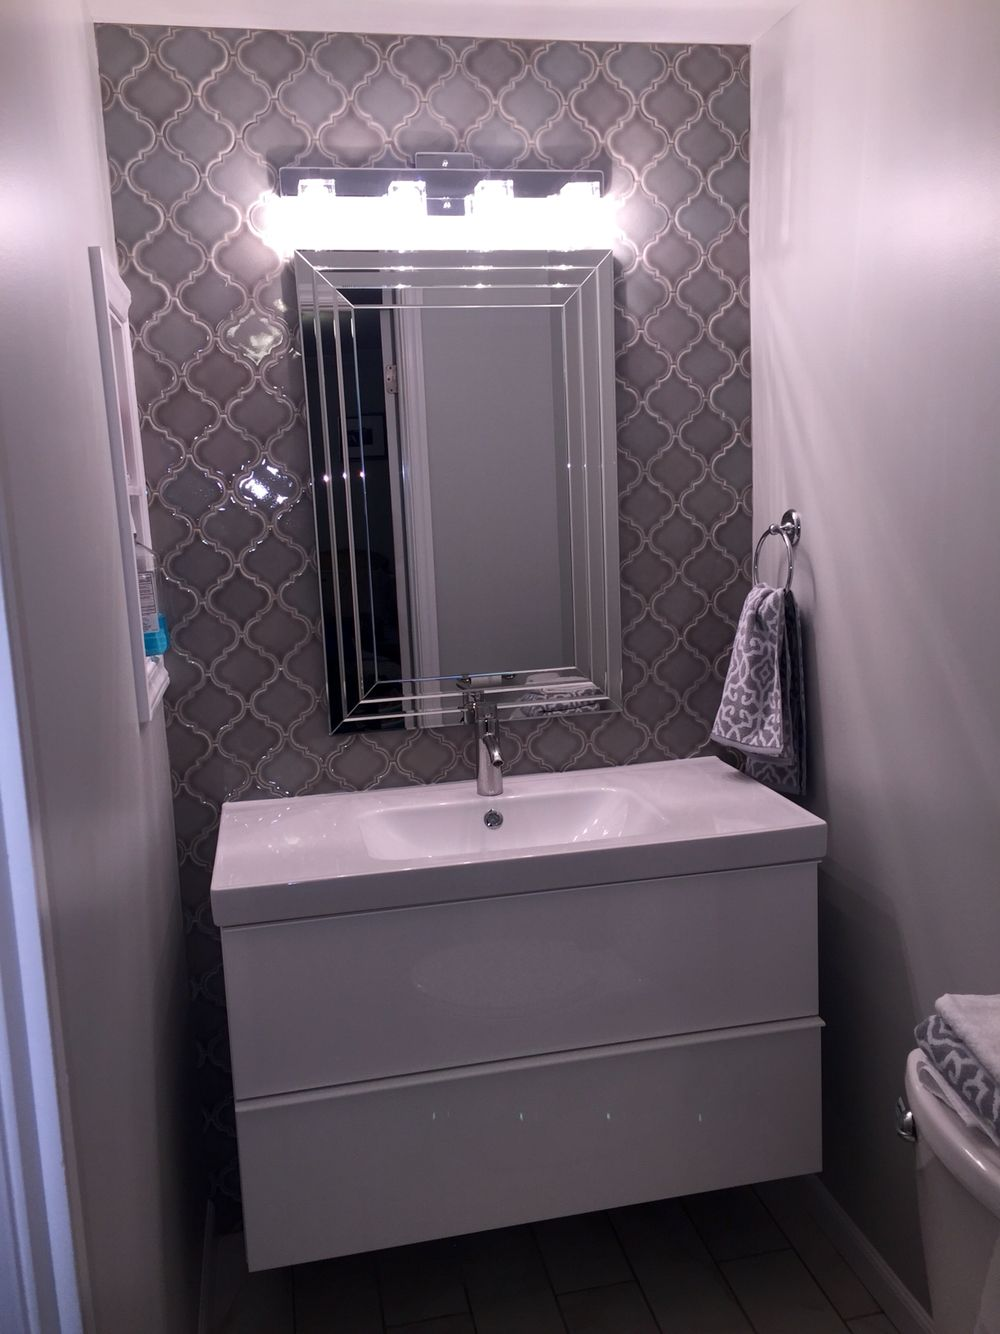 Floating Bathroom Vanity With Dove Grey Arabesque Tile